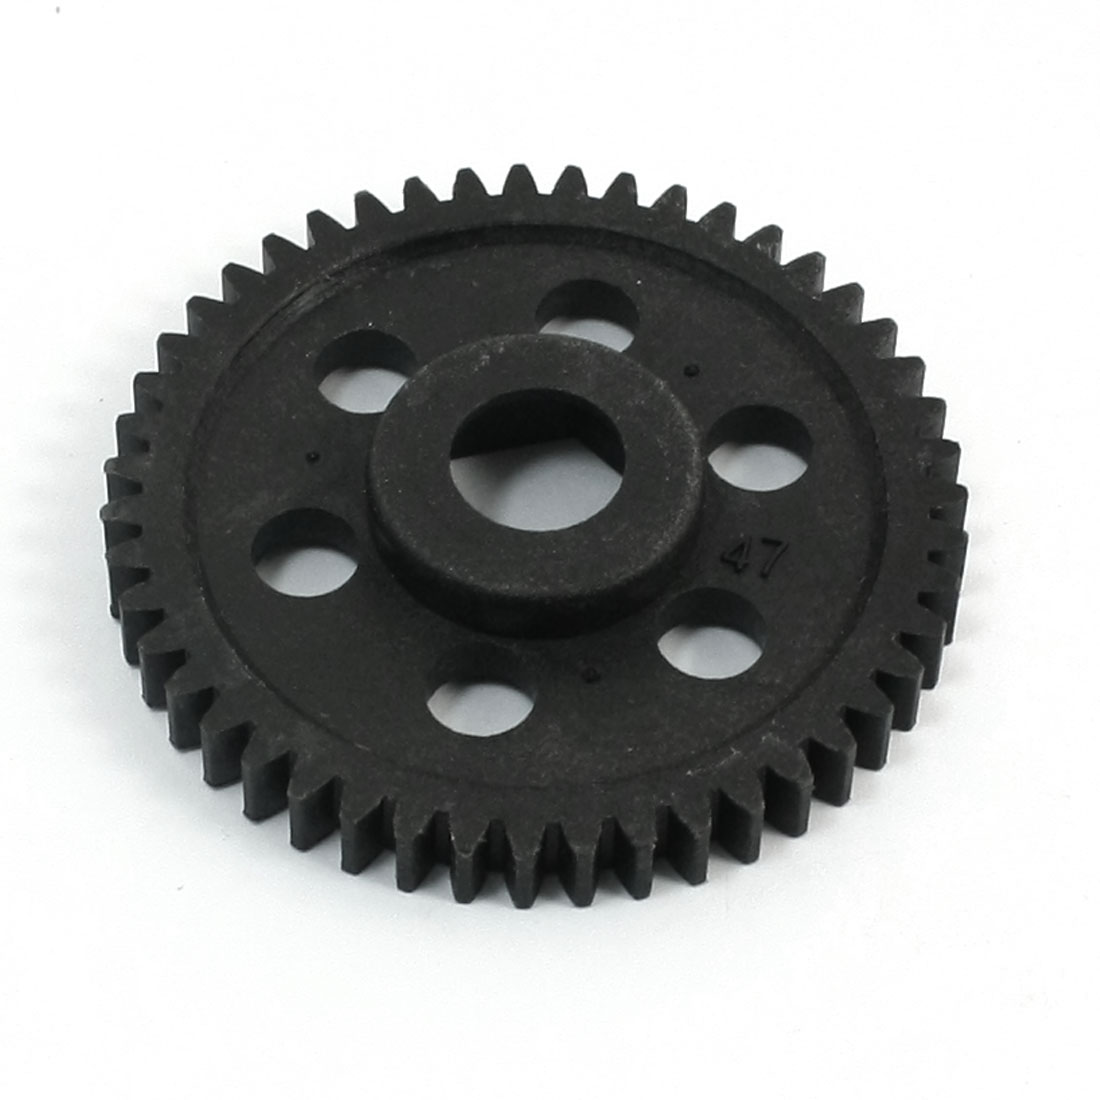 06232 47T Black Plastic Spur. Gear 49mm for 94106/94166 RC 1/10 Car